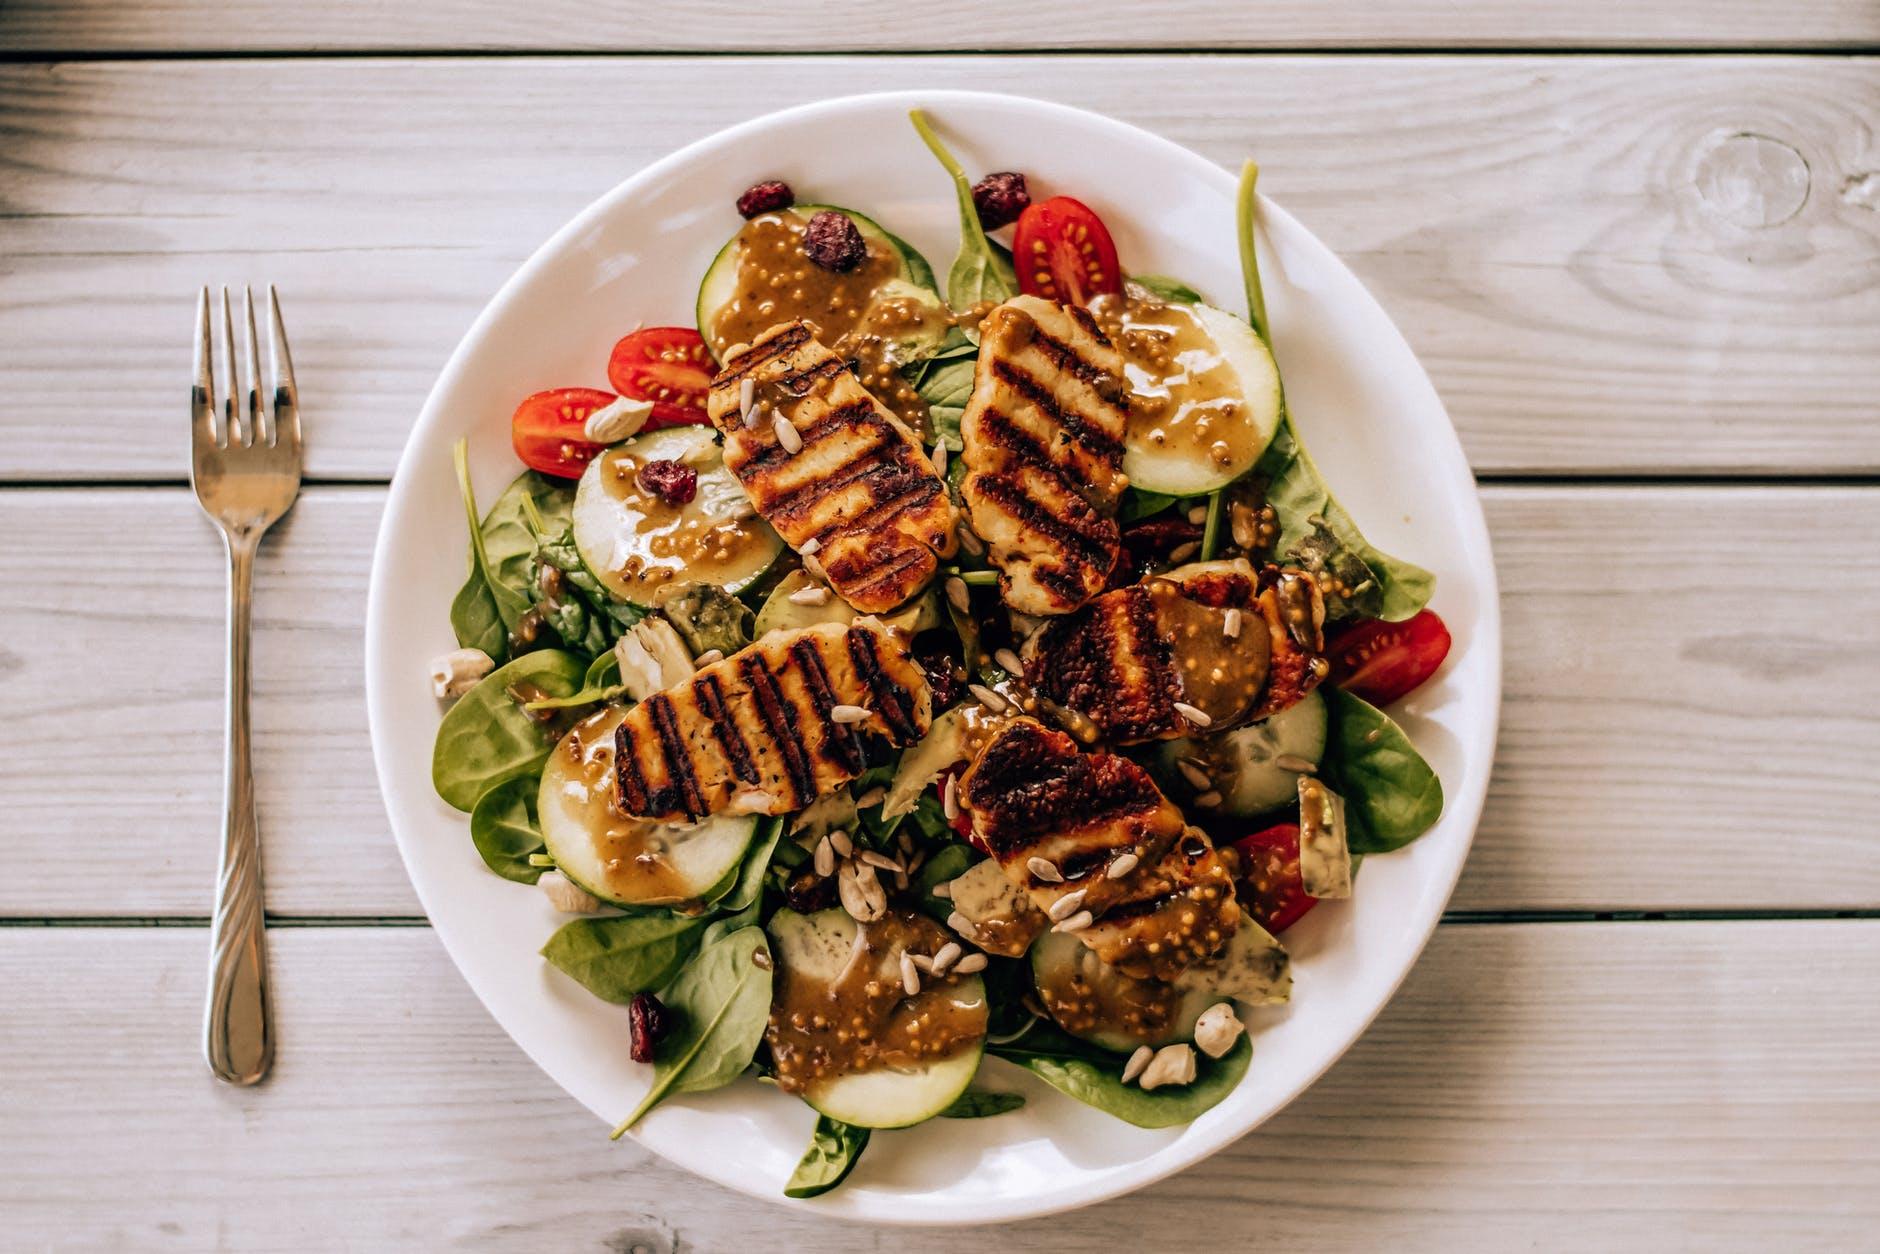 Meal planning, risparmiare sulla spesa programmando